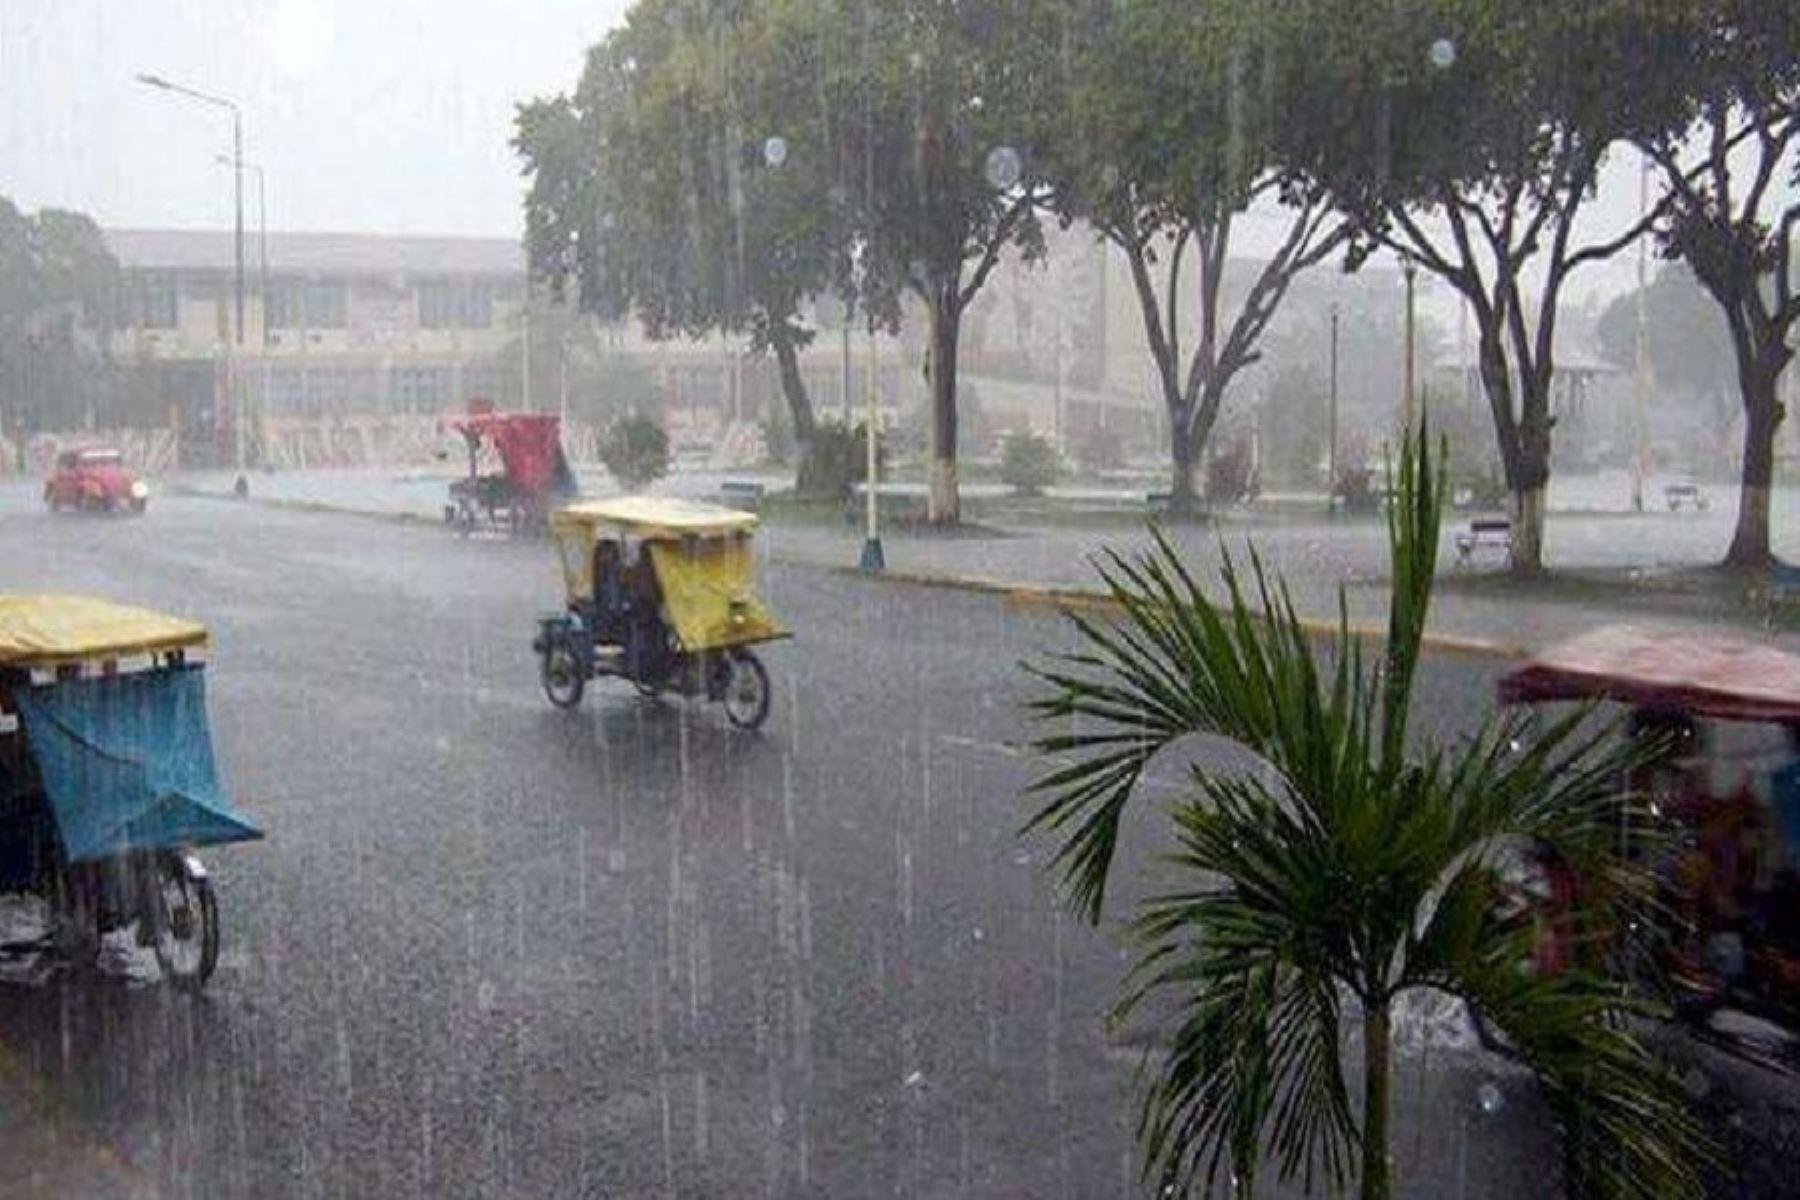 Senamhi pronostica lluvias intensas en la selva del martes 23 al jueves 25 de abril. ANDINA/Difusión